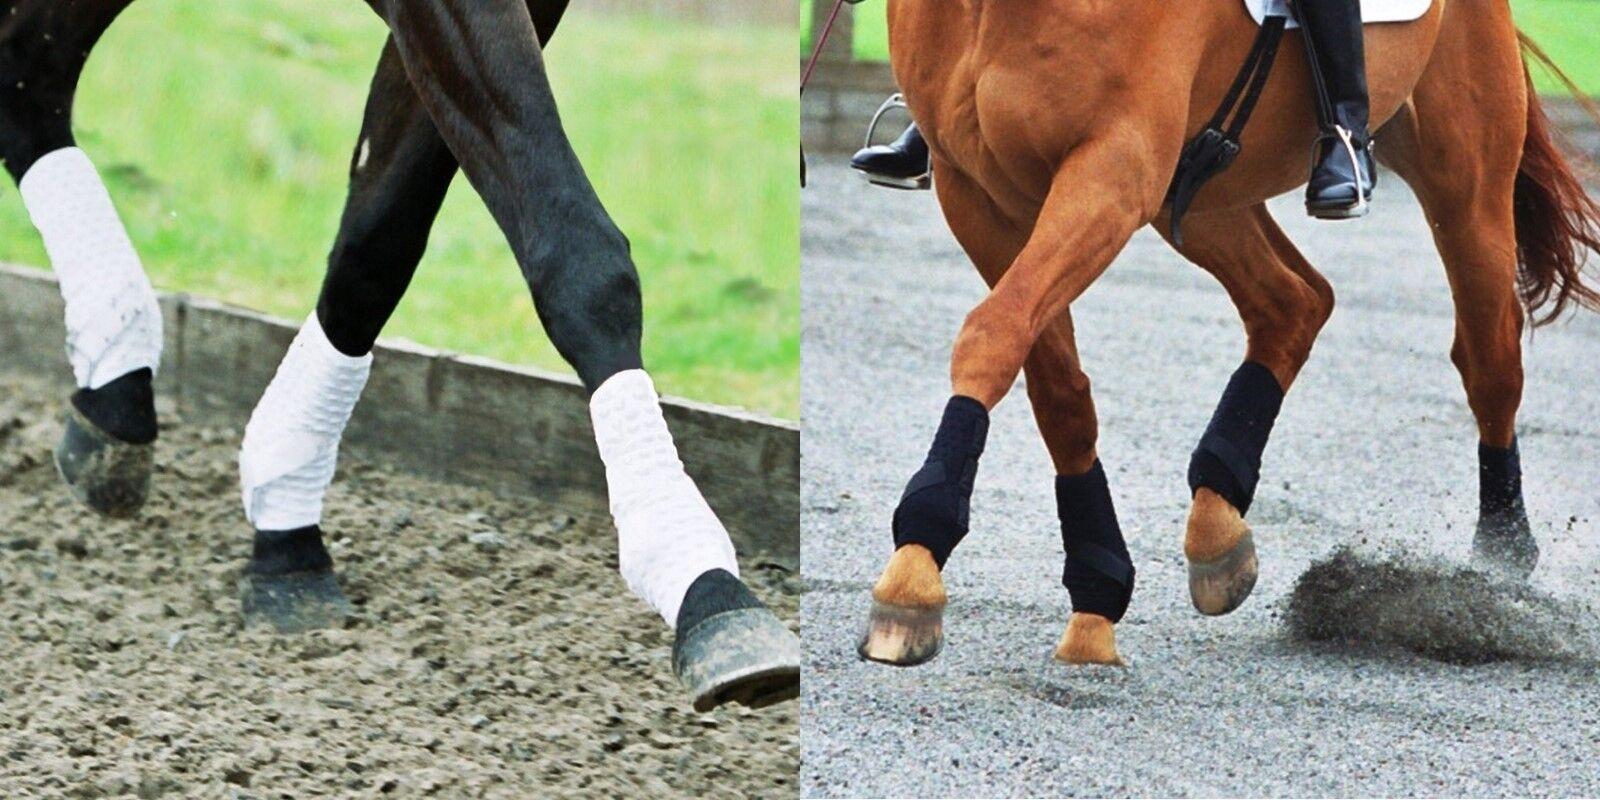 EQUILIBRIUM STRETCH AND FLEX TRAINING WRAPS PONY COB HORSE EXERCISE BOOTS